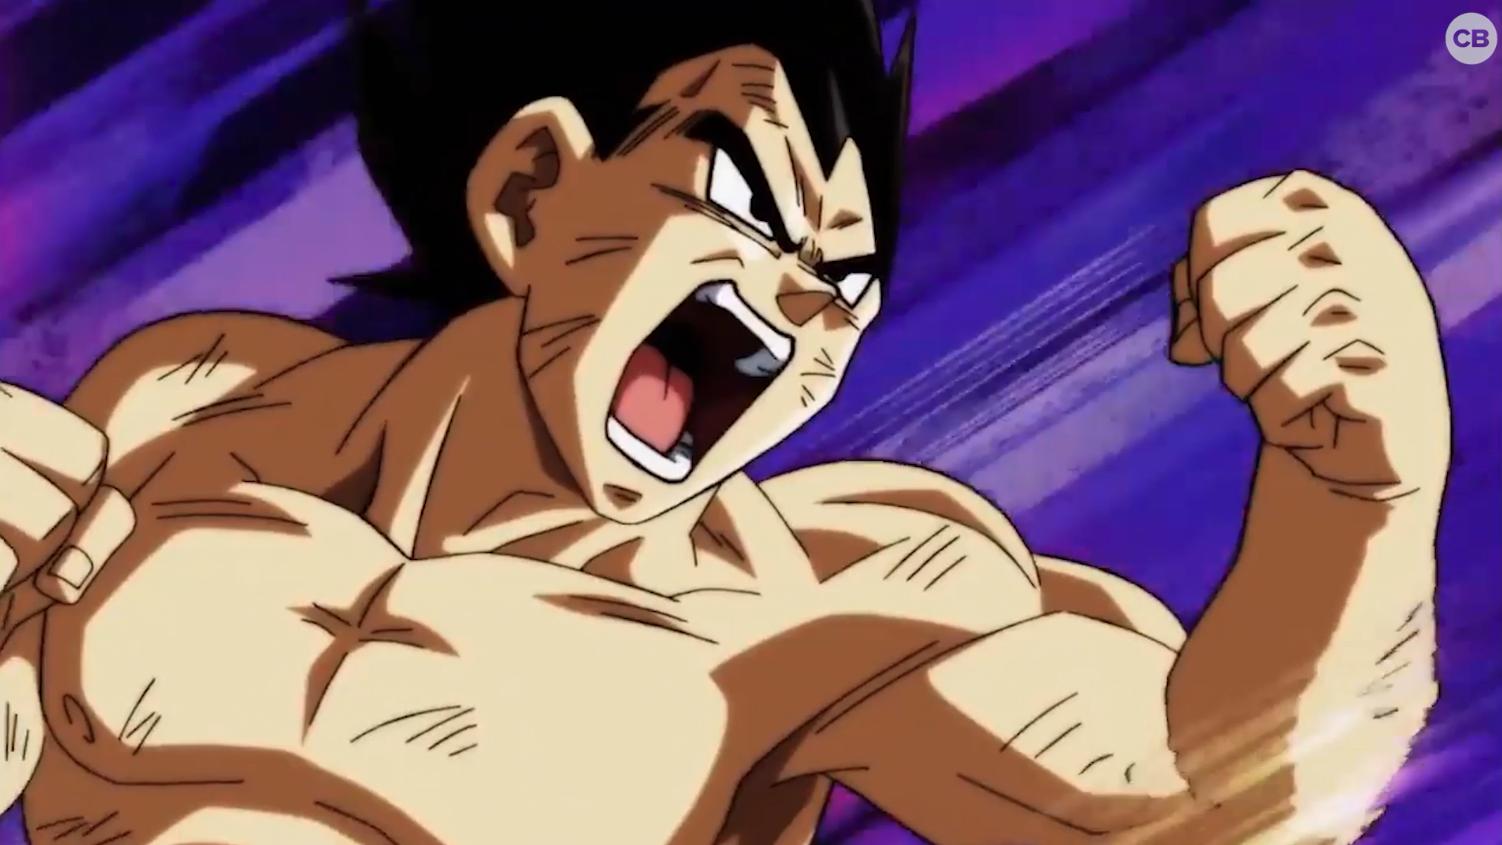 Dragon Ball Super - Why Vegeta Needs a Win